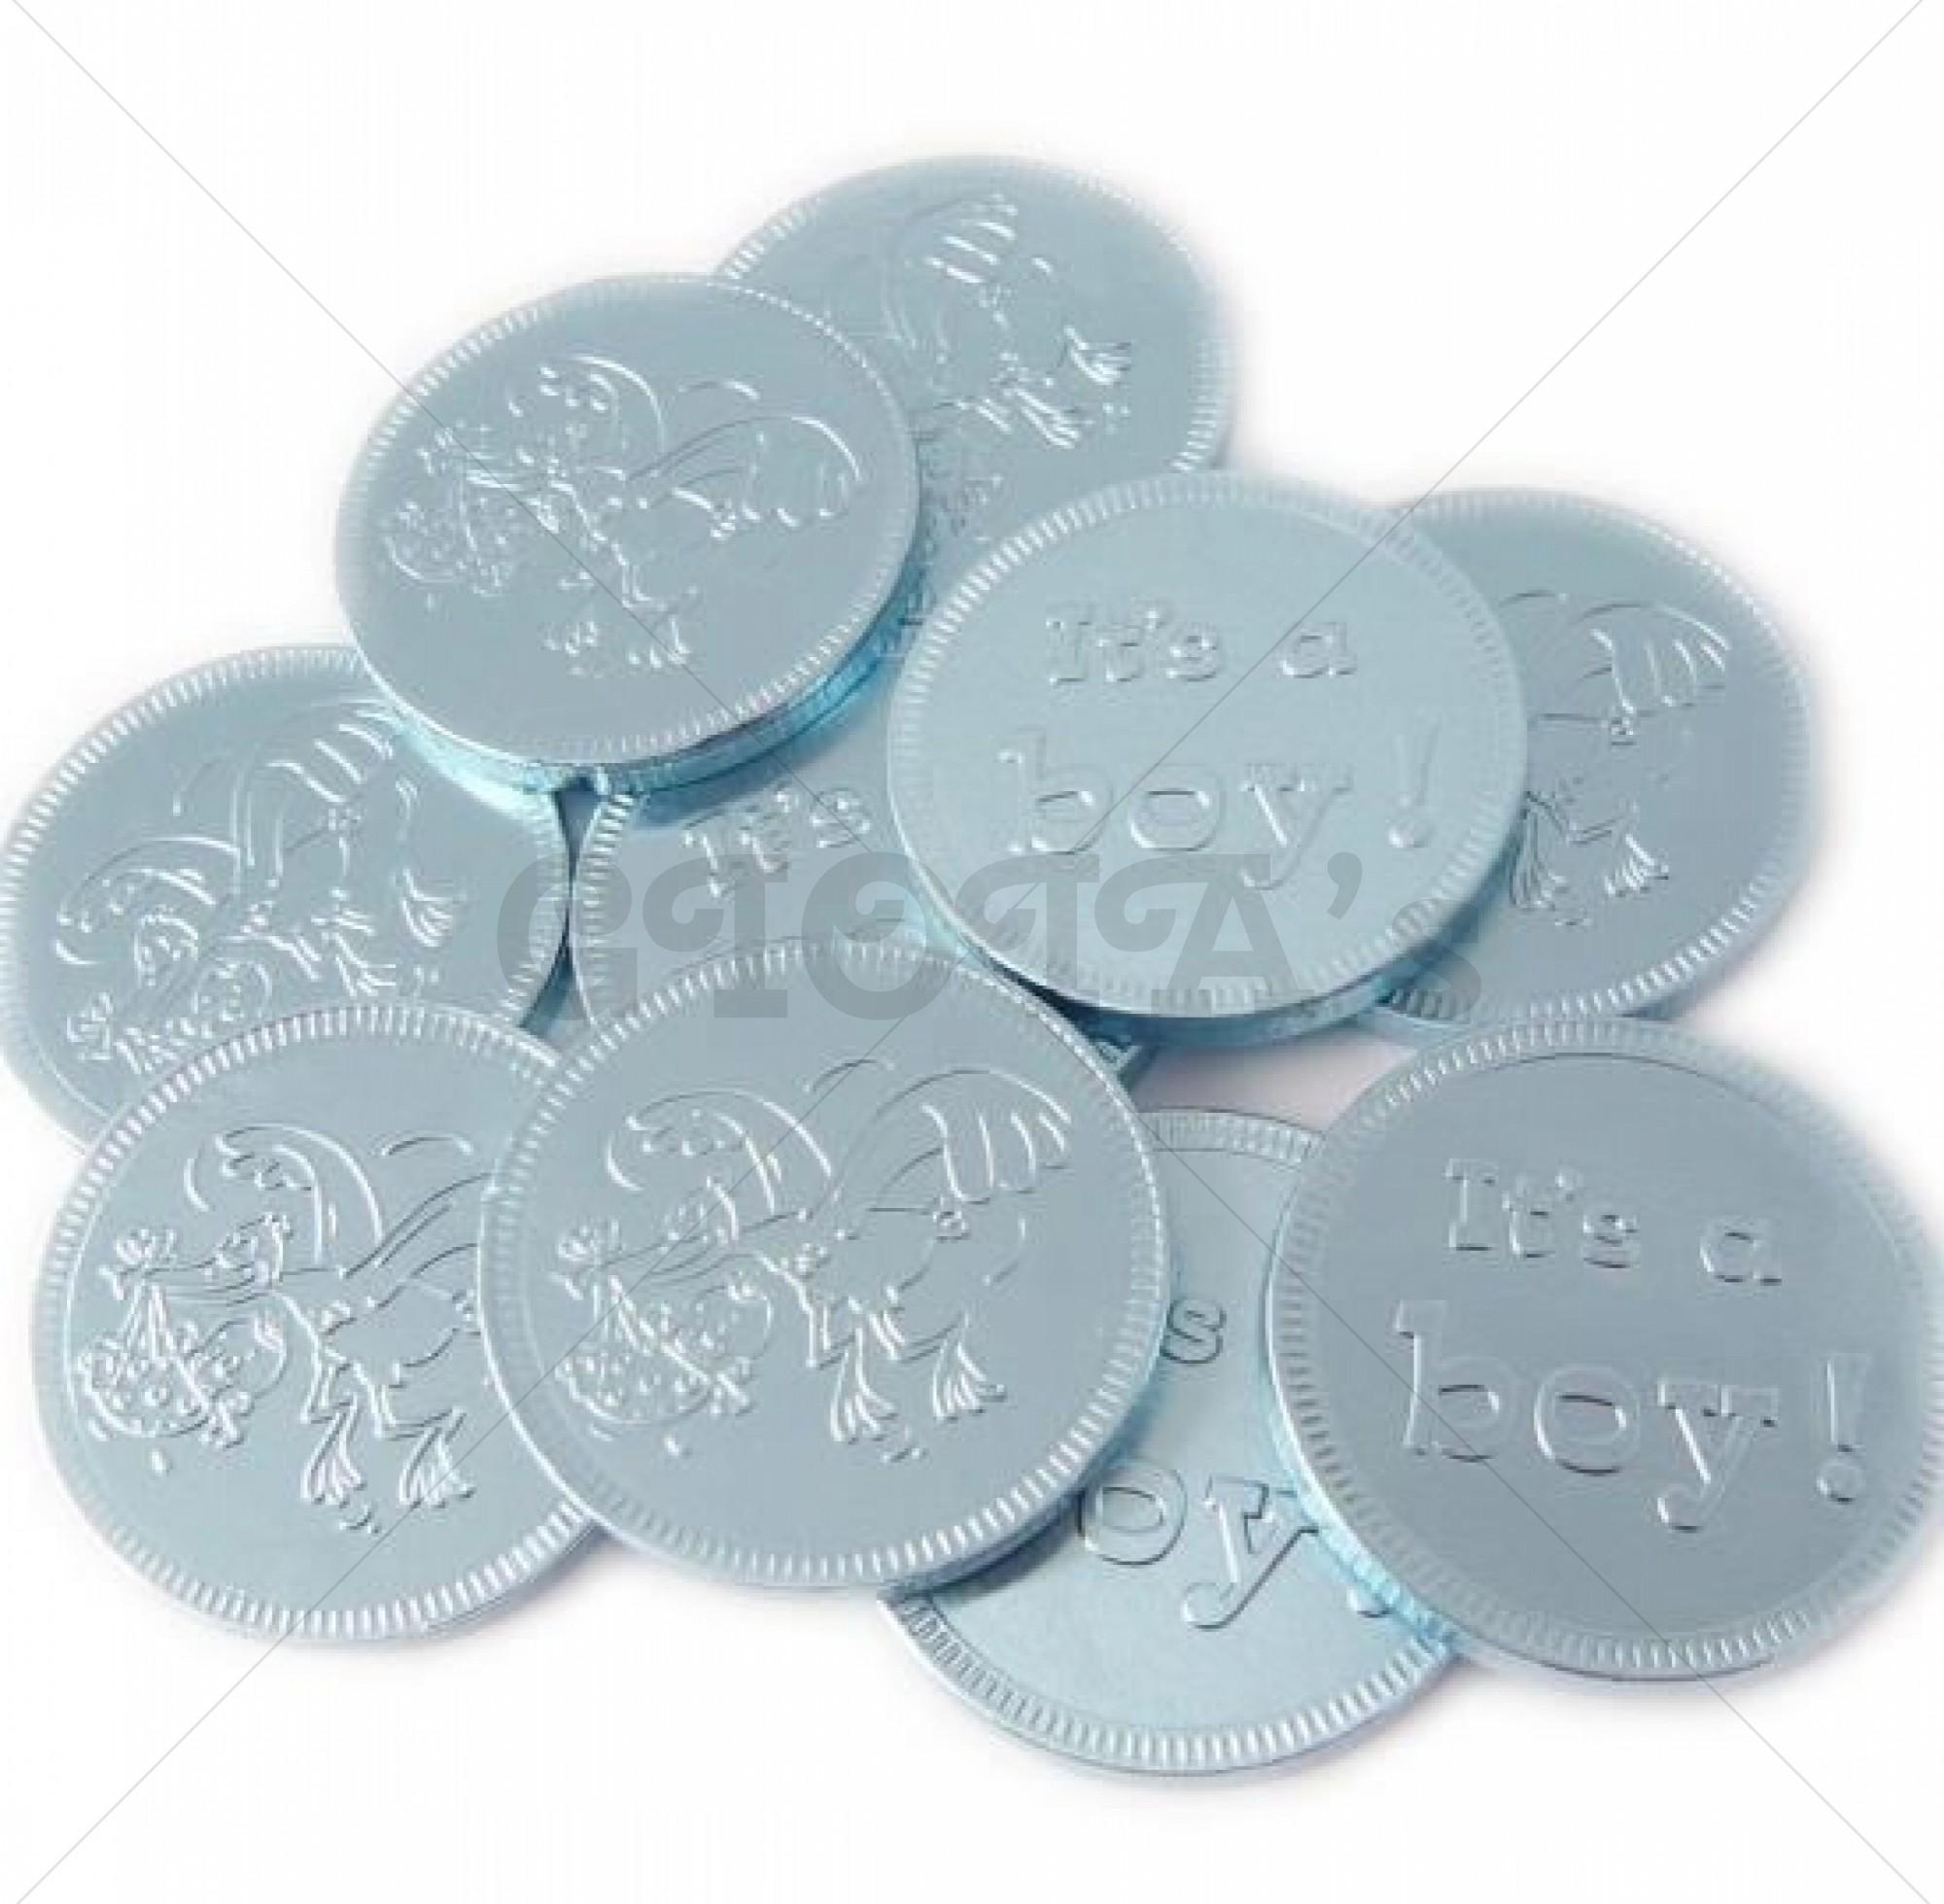 Themasnoep - Babymunt - blauw melkchocolade prijs per stuk